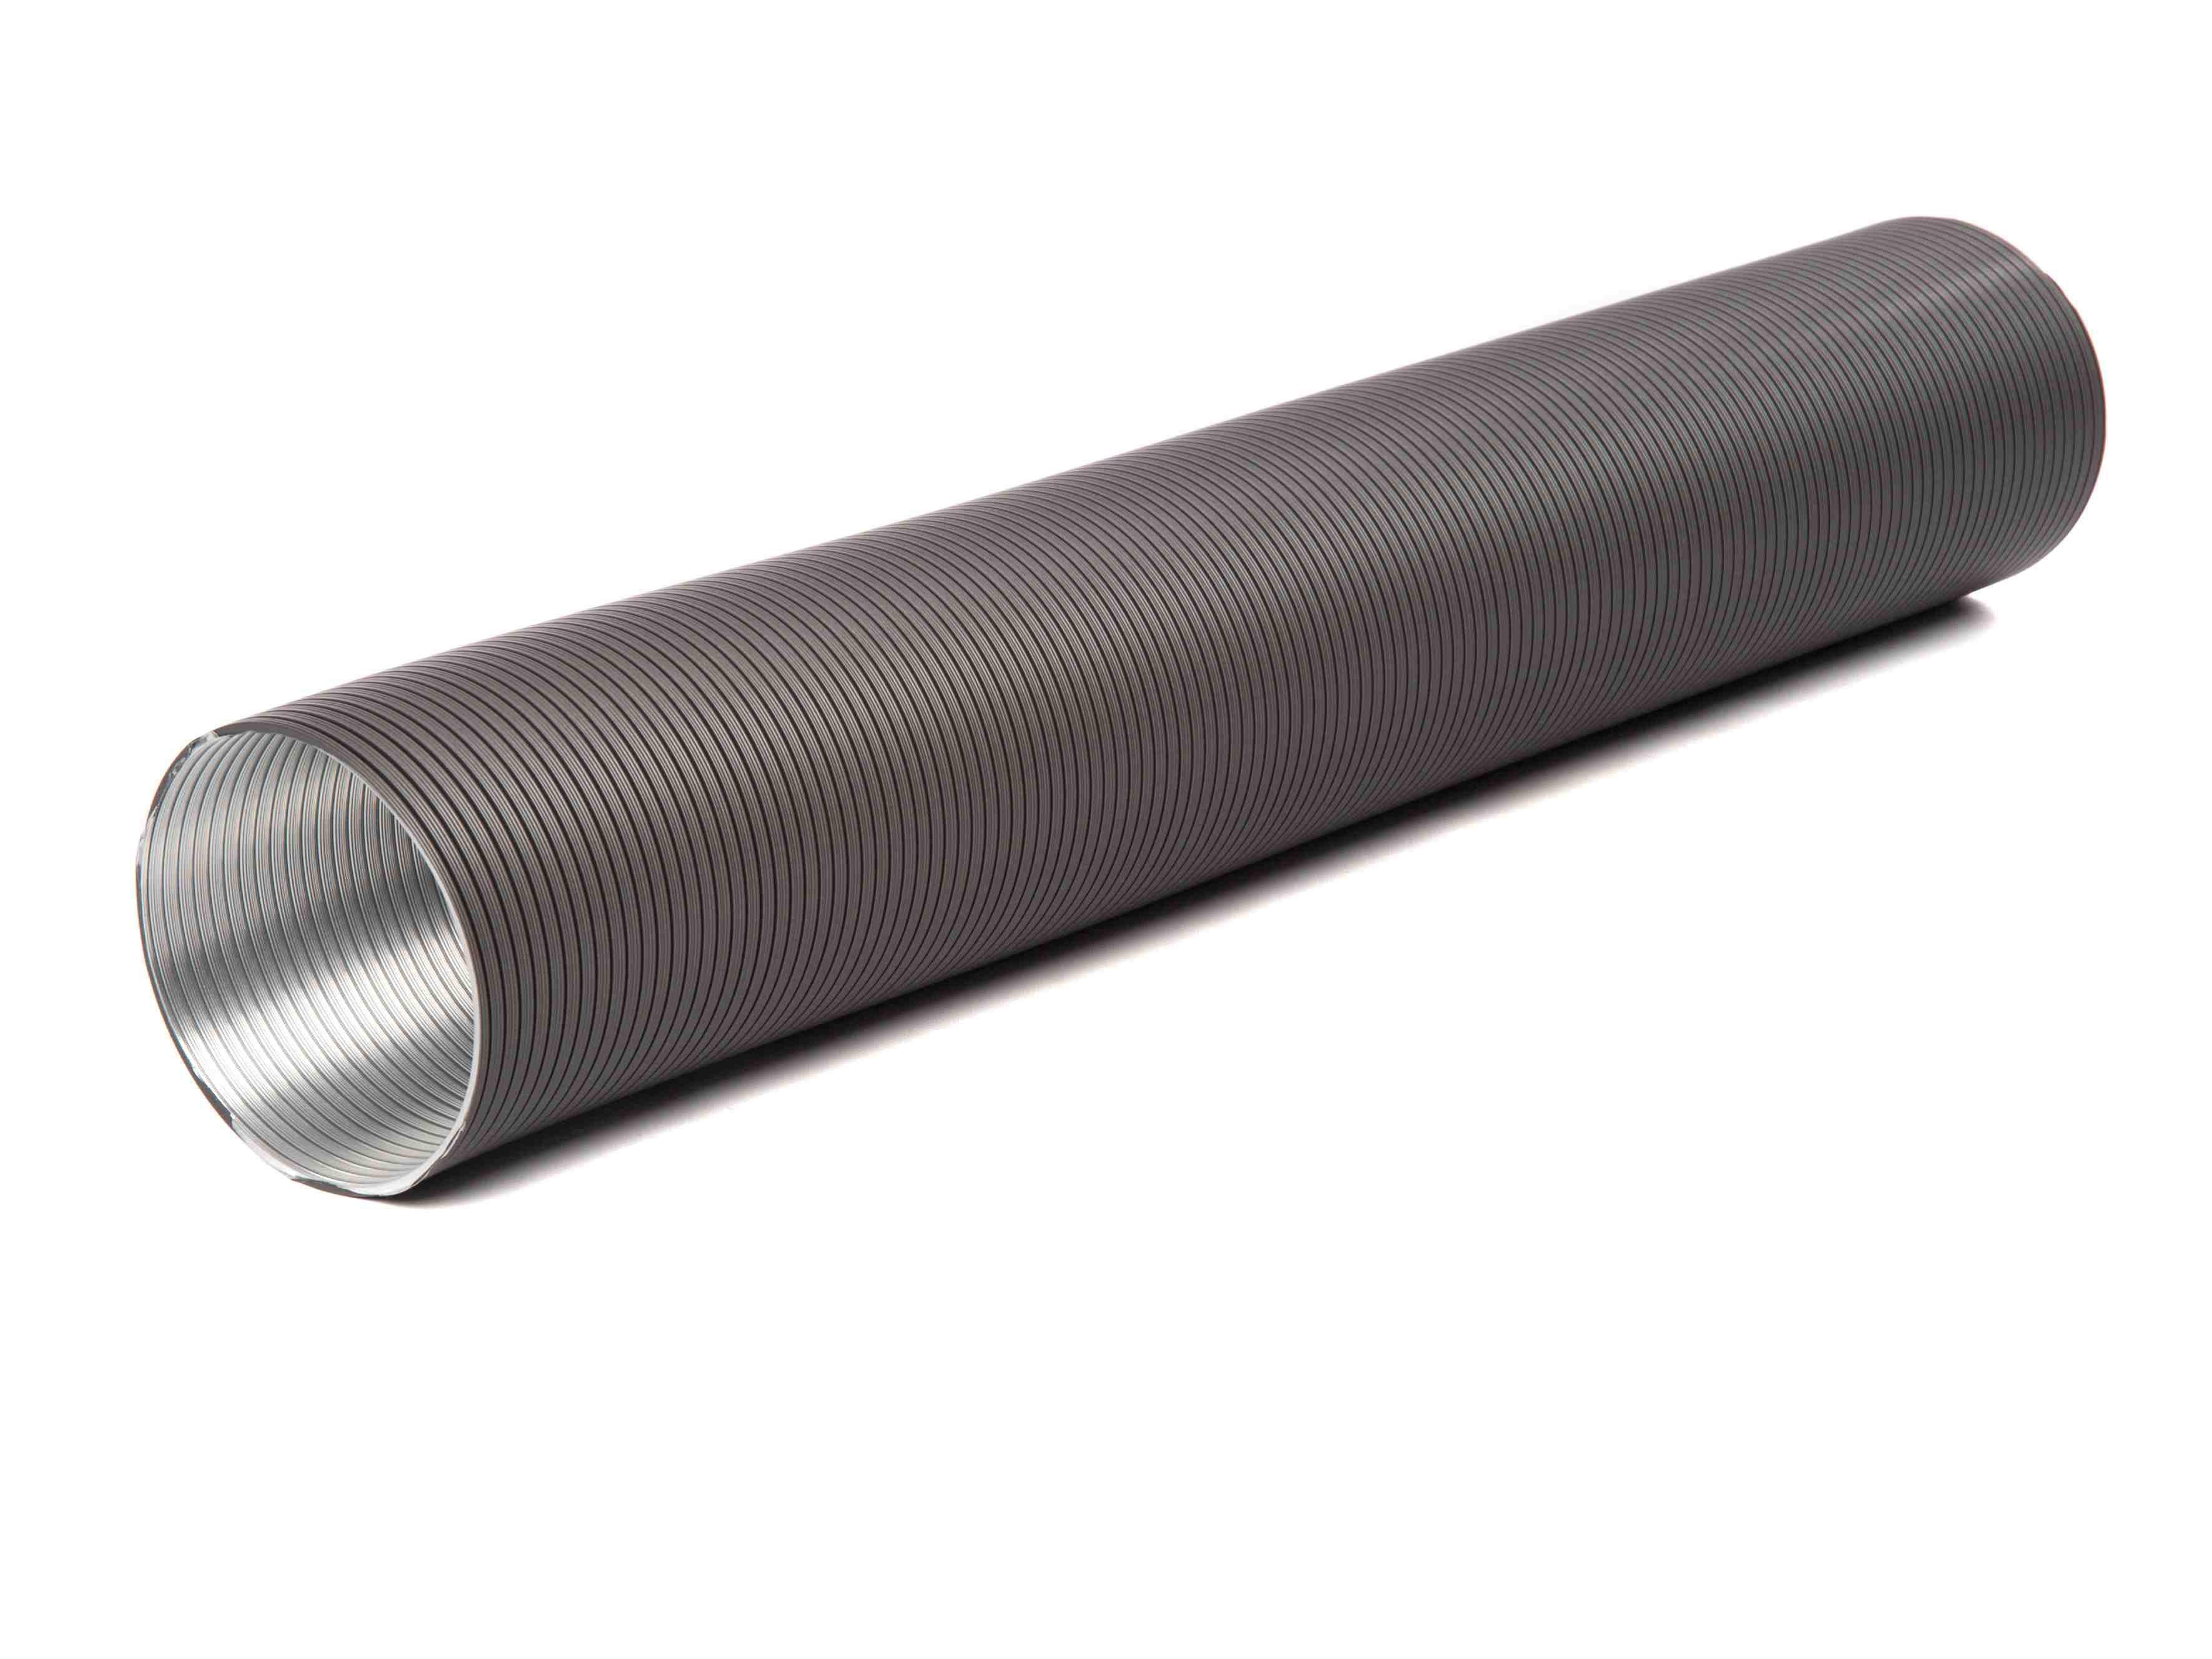 Flexibles Lüftungsrohr aus Aluminium Ø100mm grau Bild 1